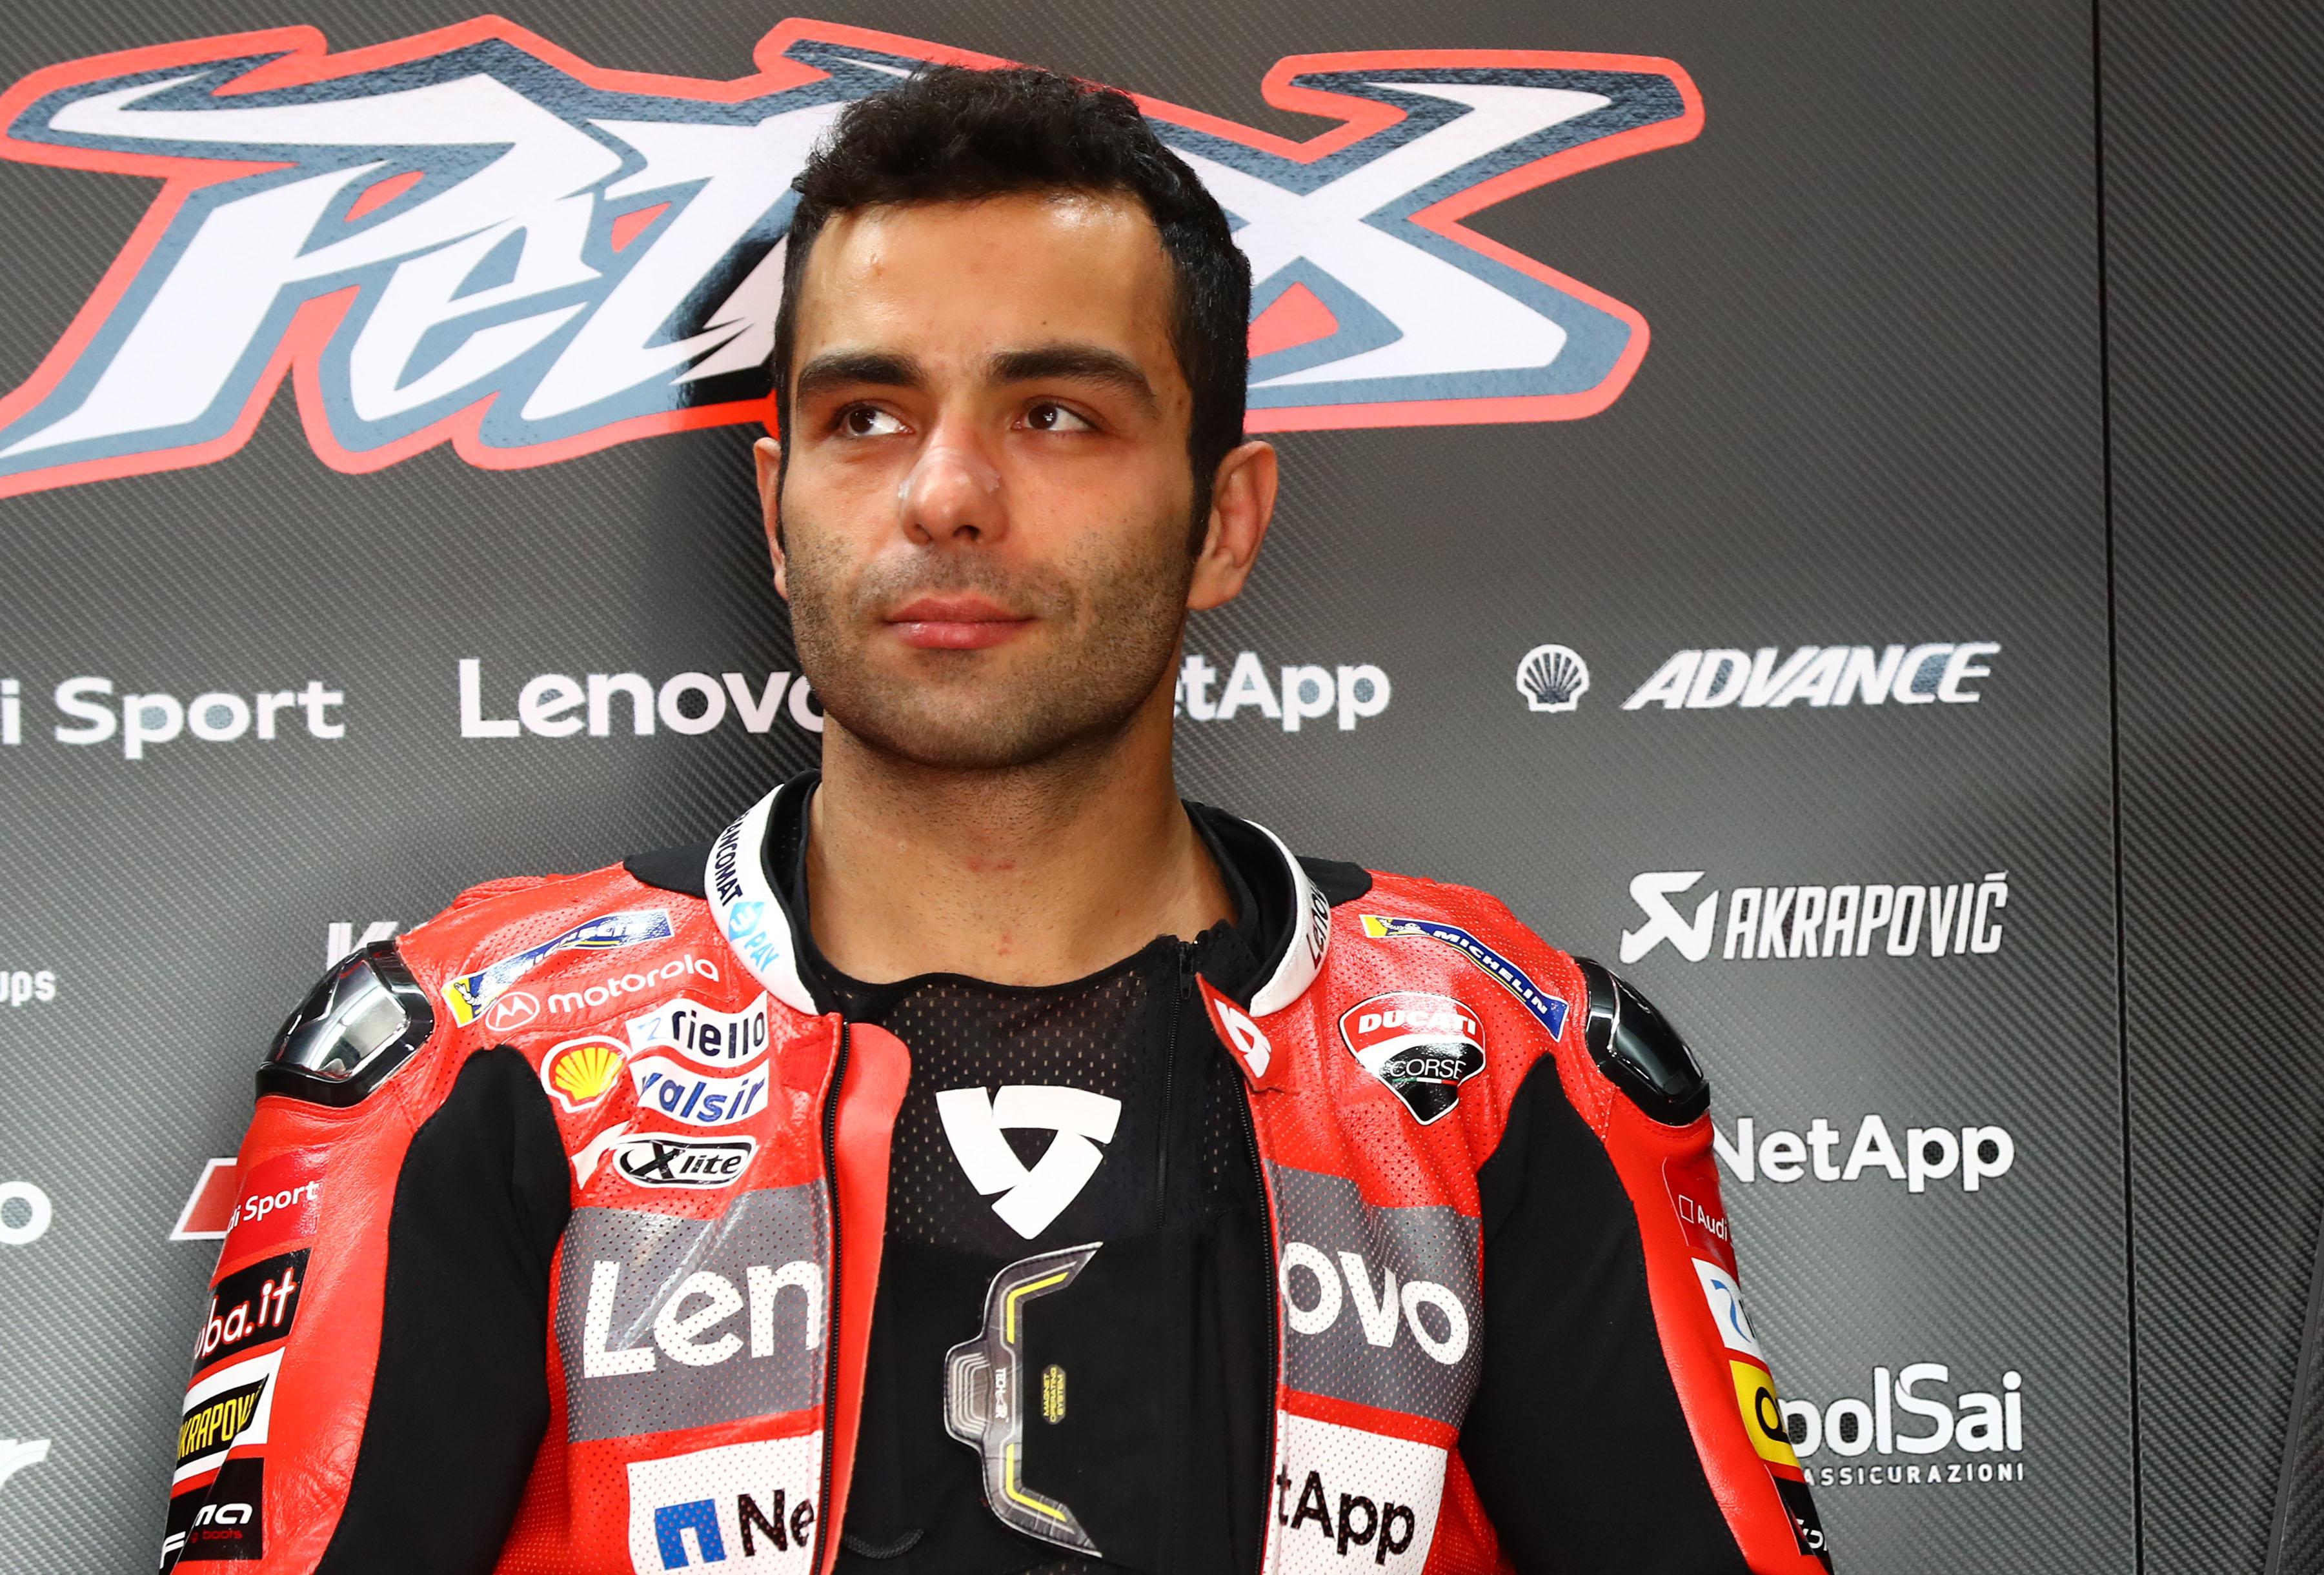 Danilo Petrucci MotoGP KTM 2020